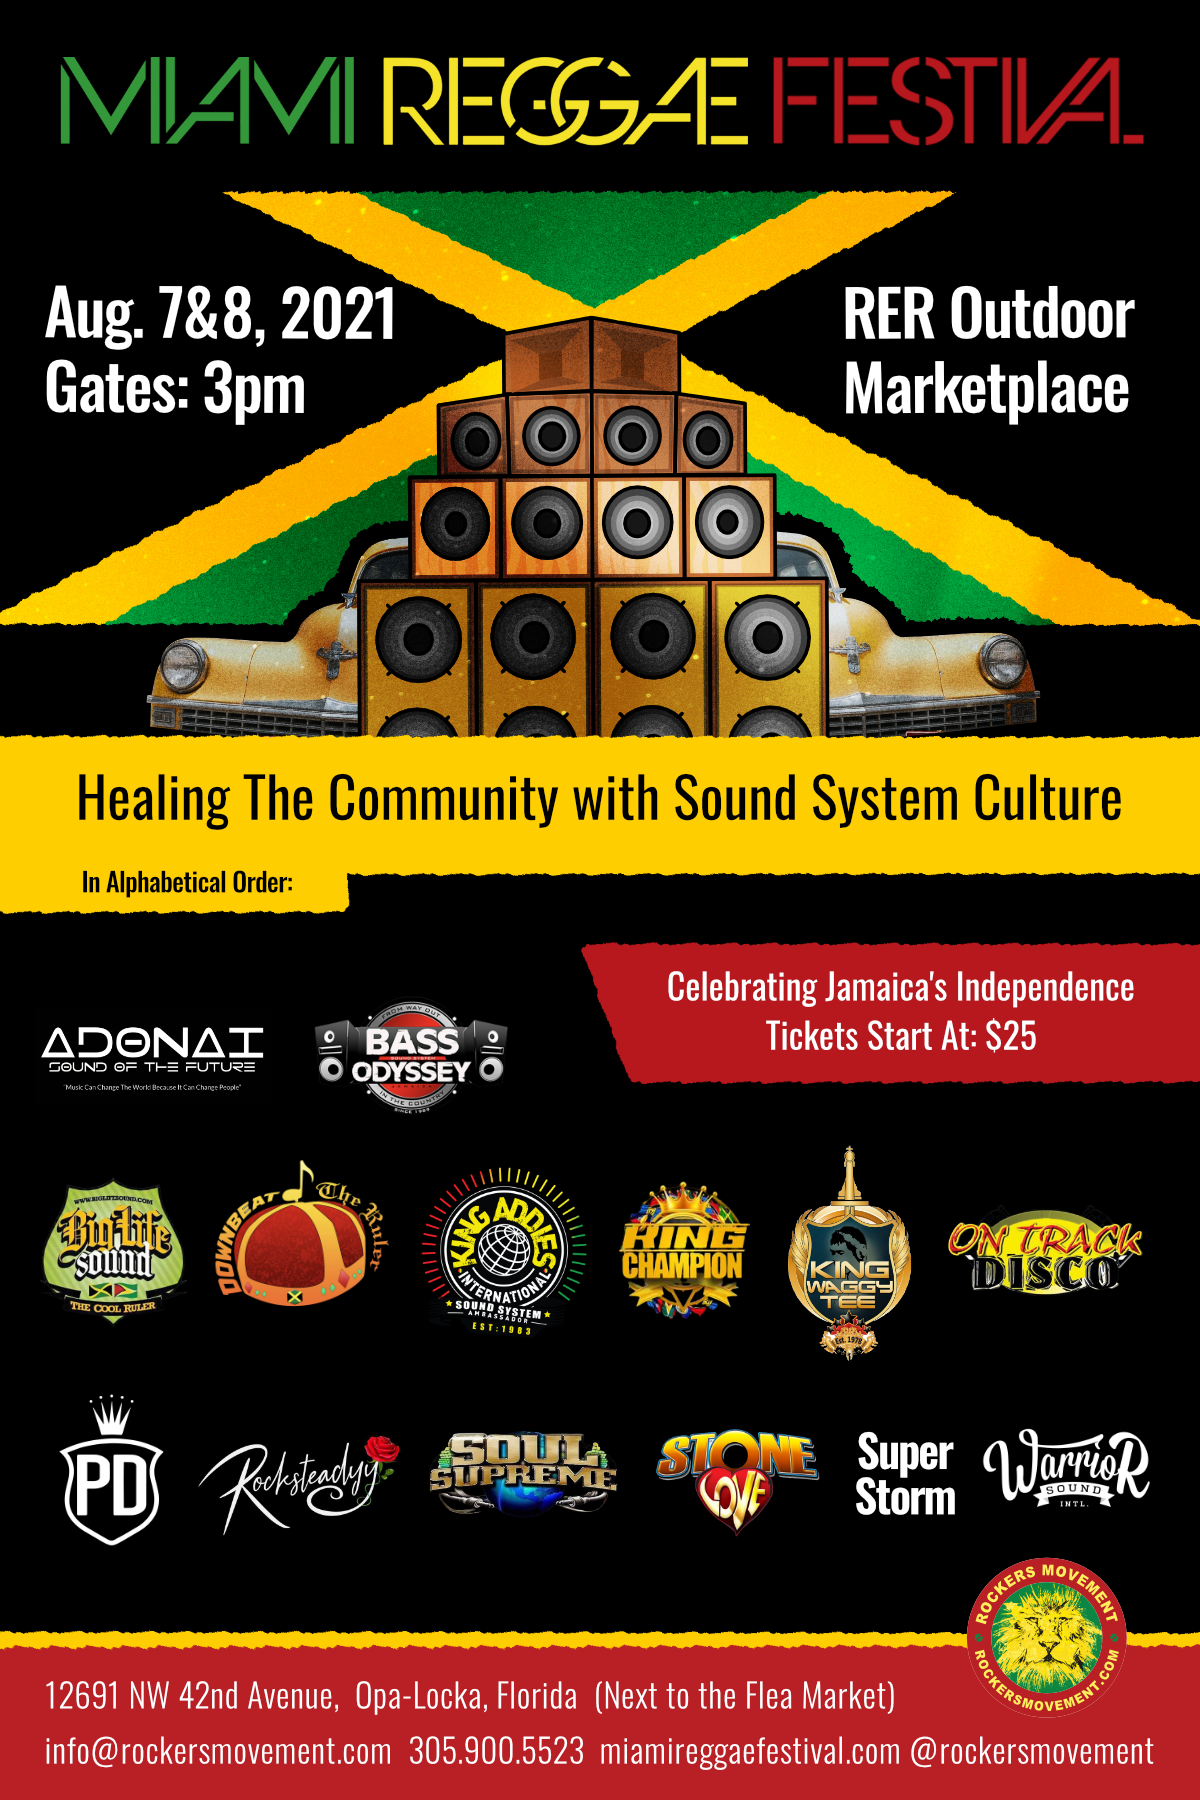 Rockers Movement Schedules Annual Miami Reggae Festival